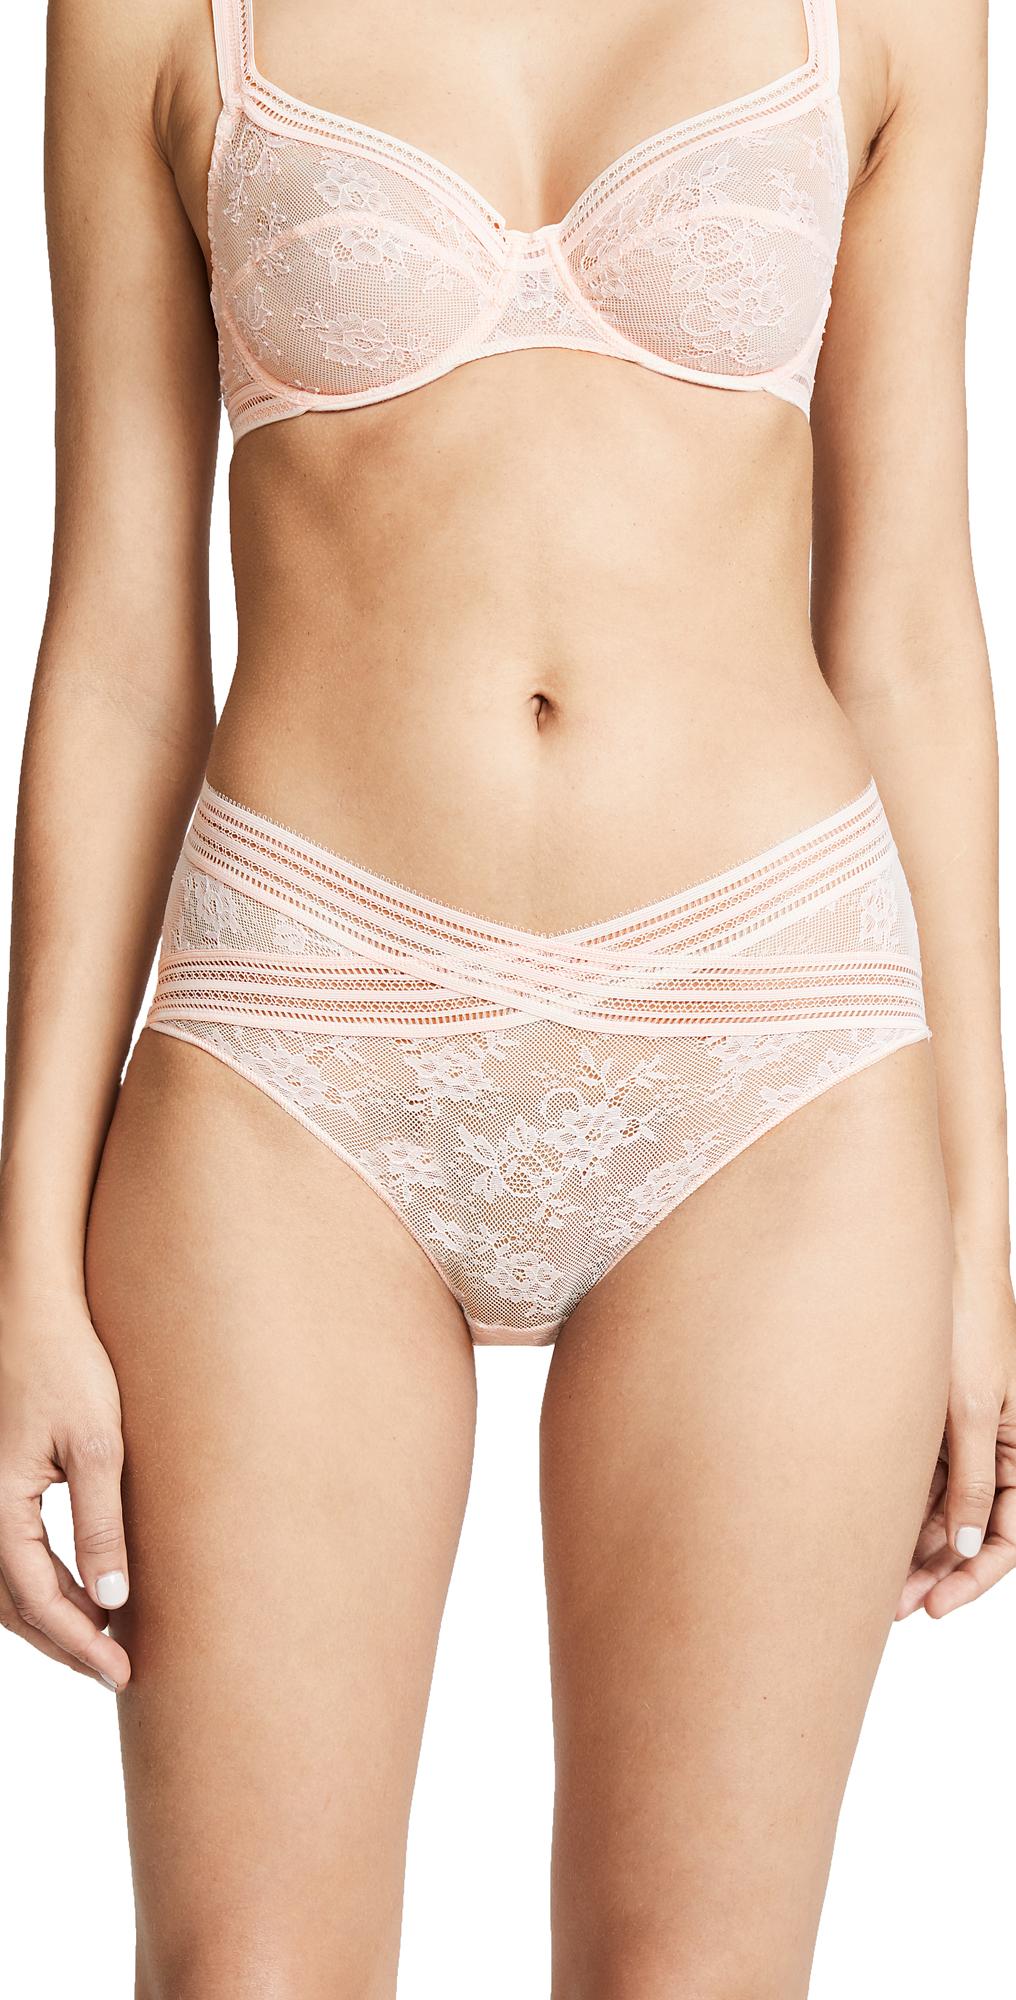 Maison Lejaby Miss Lejaby High Waisted Bikini Panty